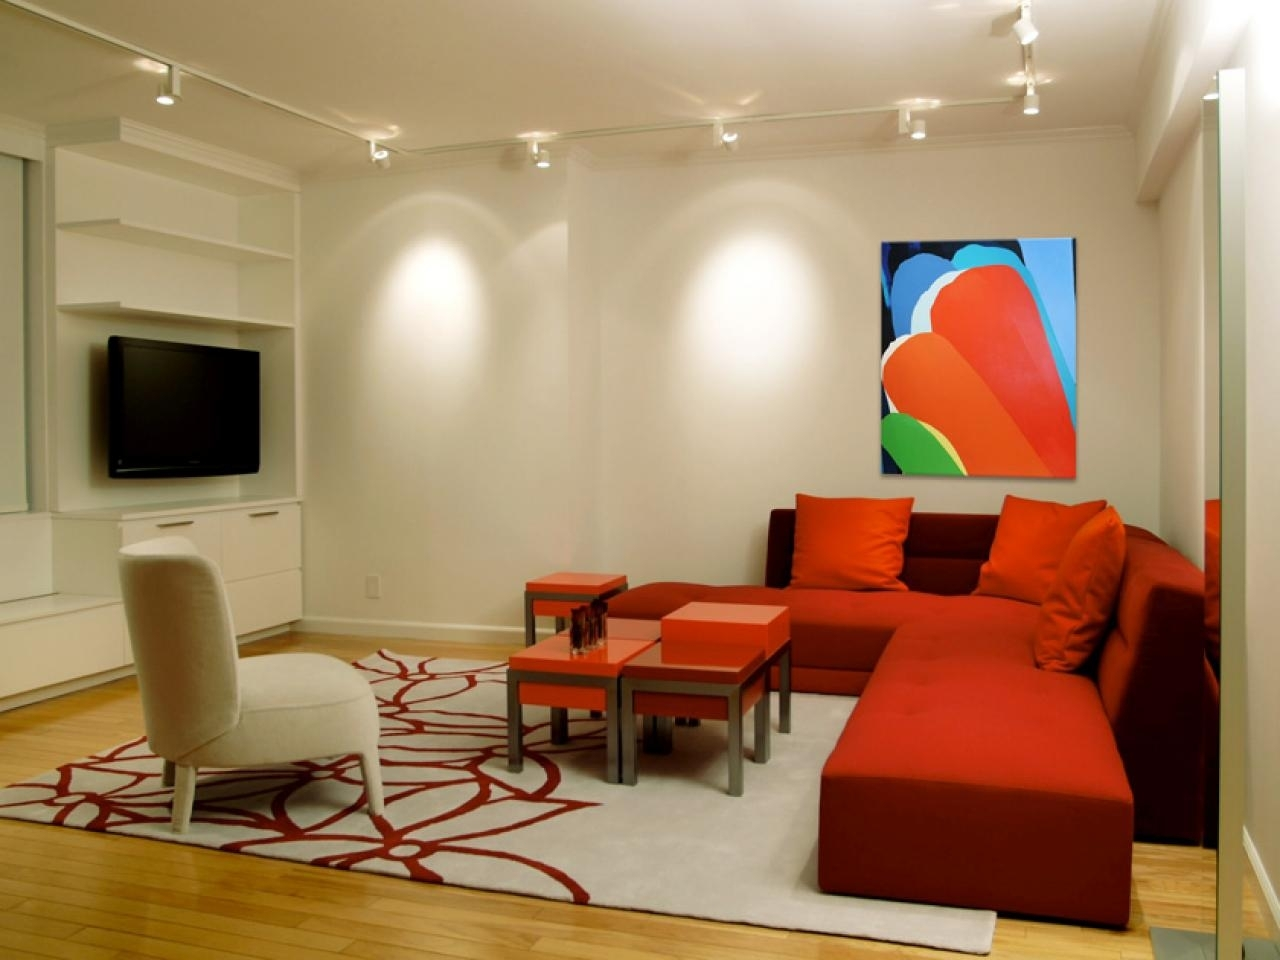 10 Famous Lighting Ideas For Living Room %name 2021